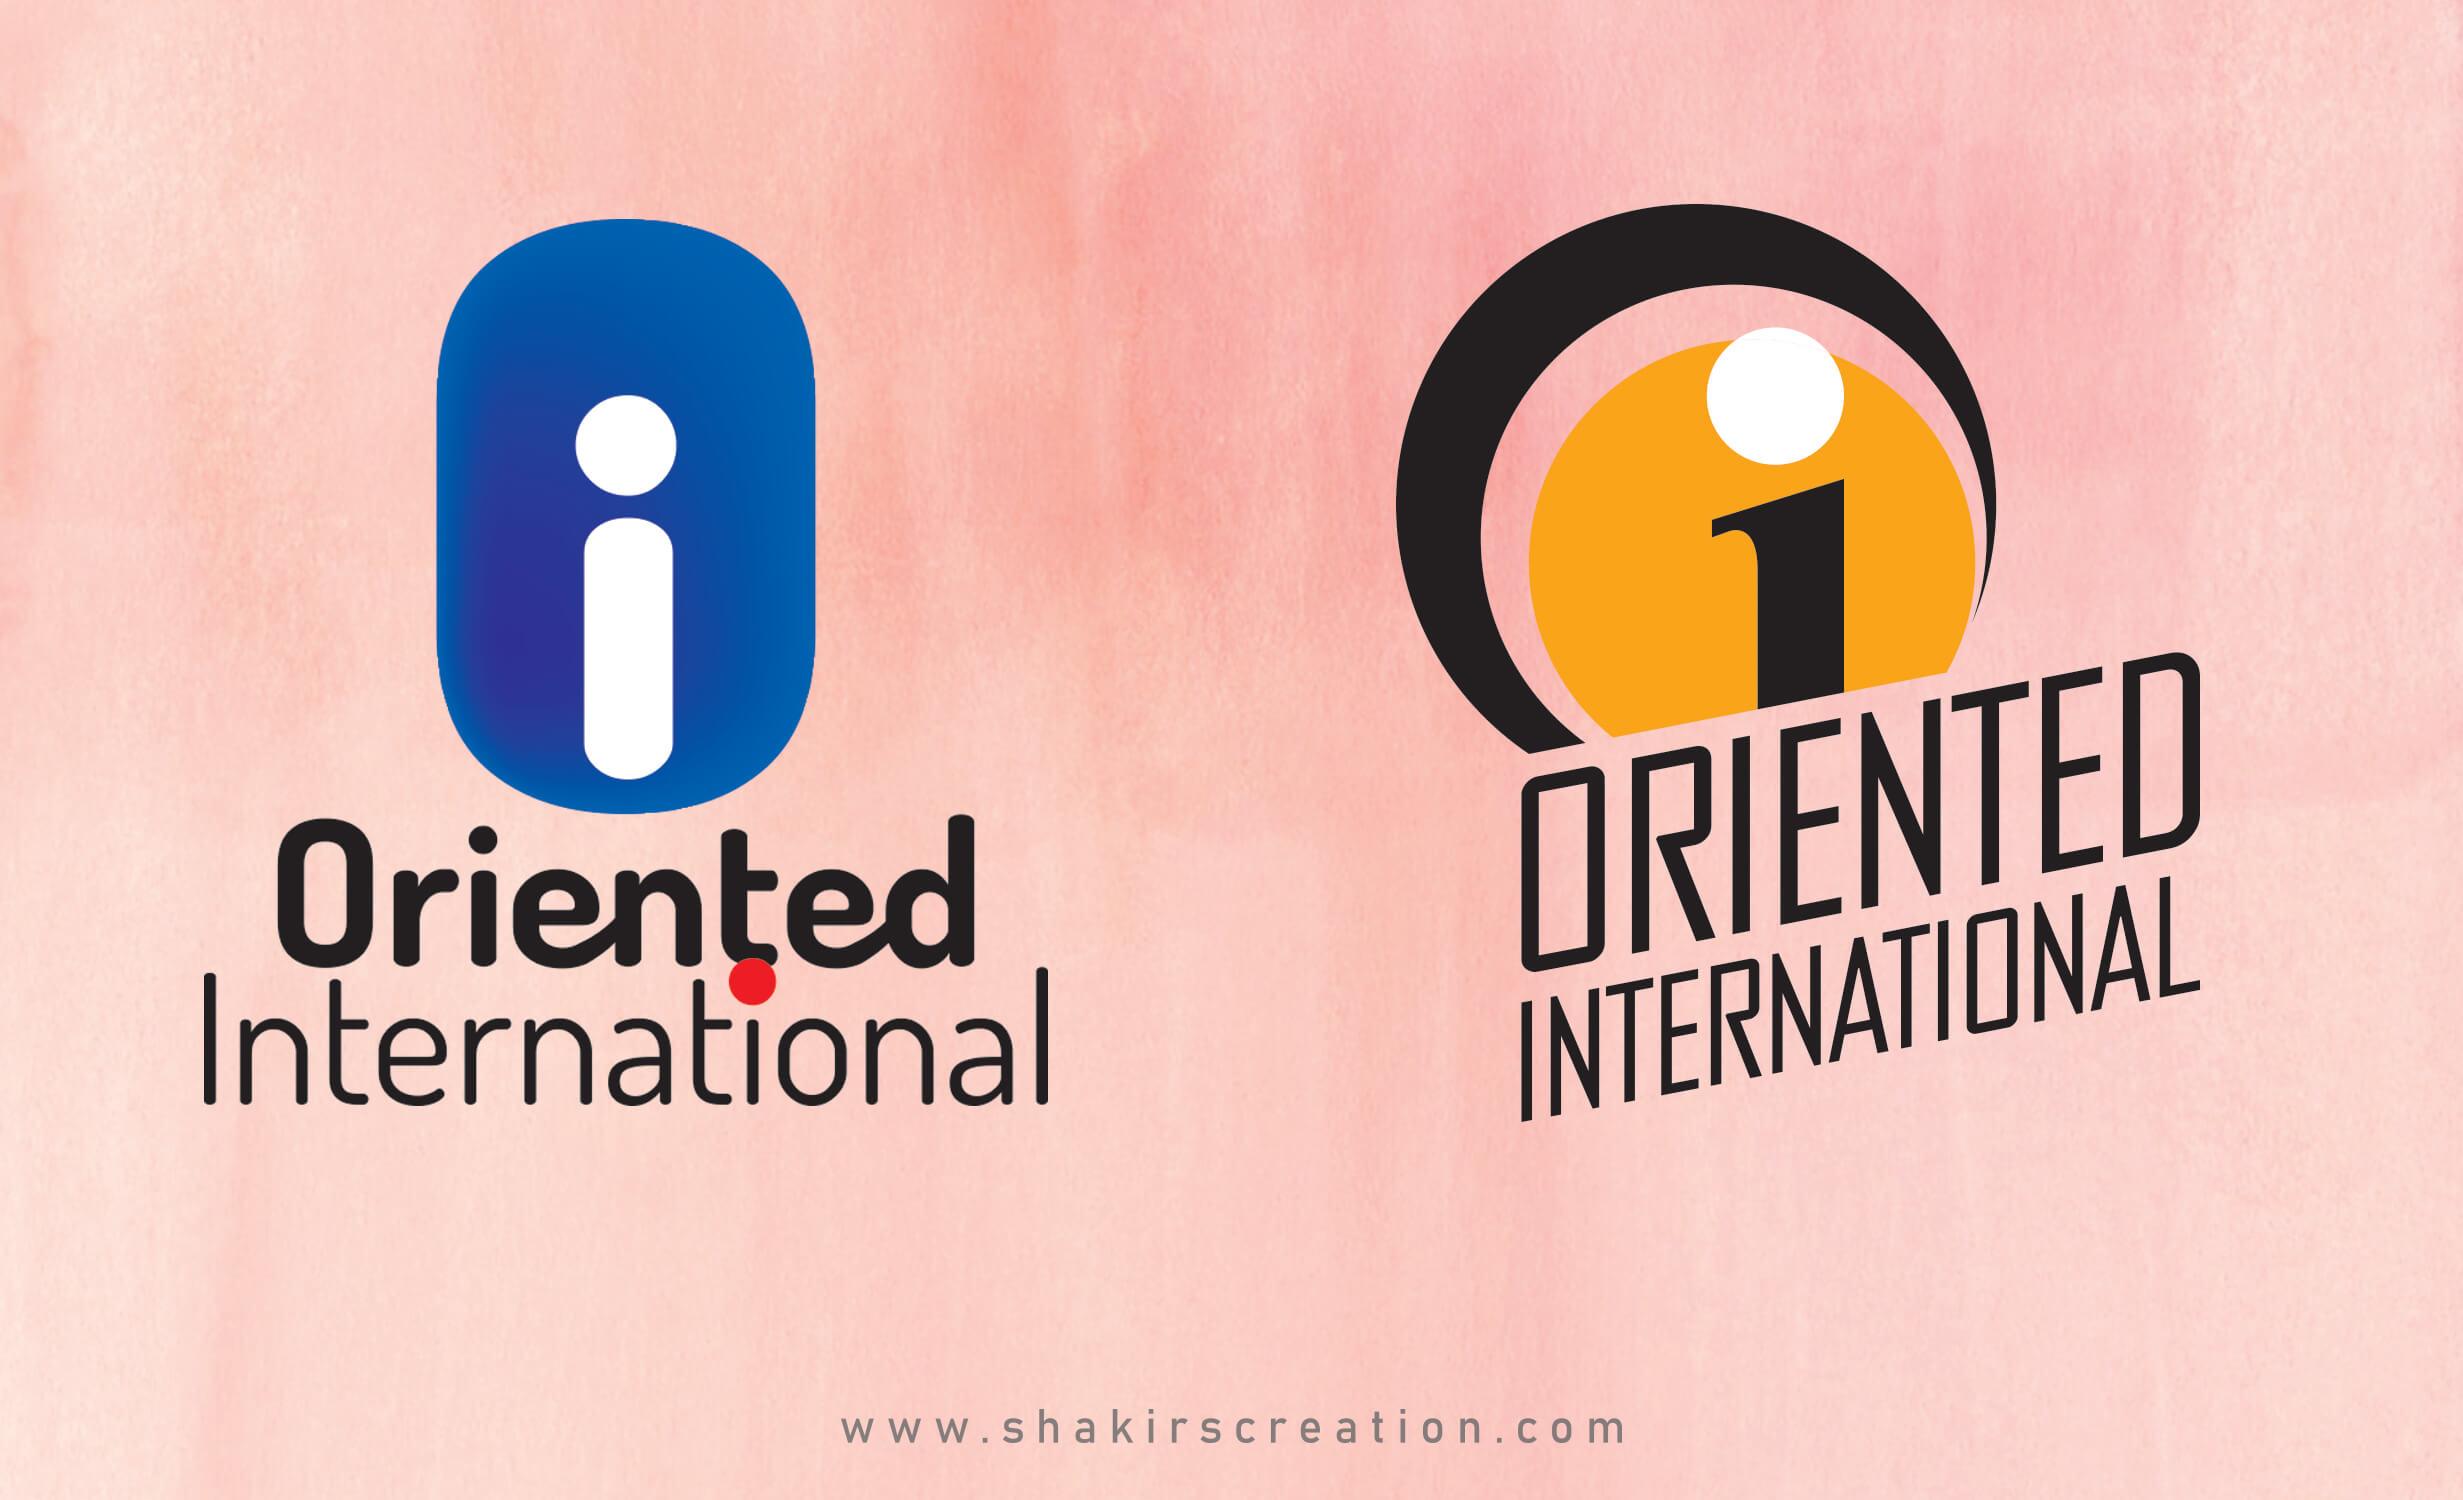 Oriented international